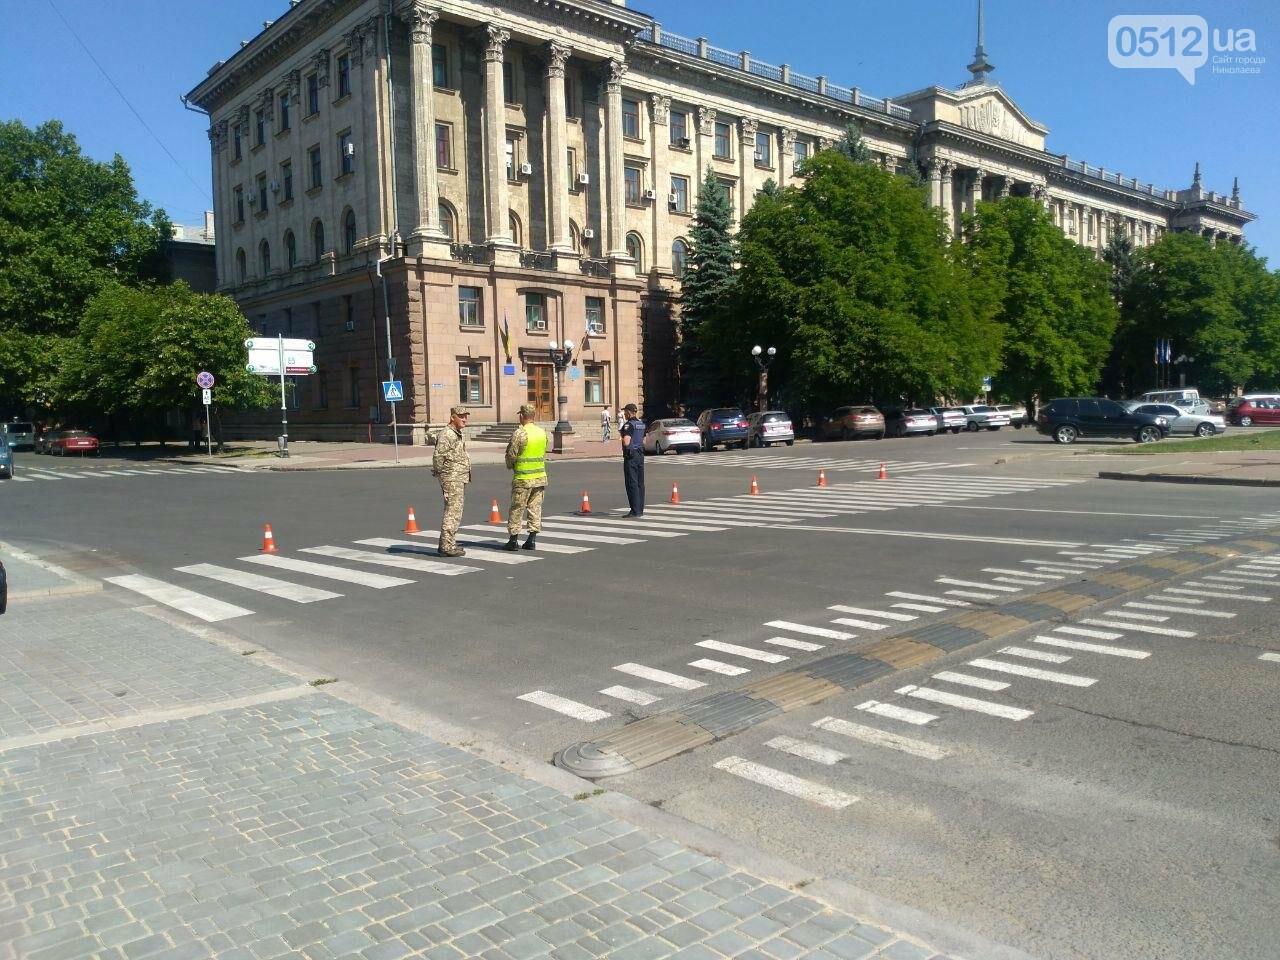 Завтра утром перекроют улицу Адмиральскую, - ФОТО, фото-2